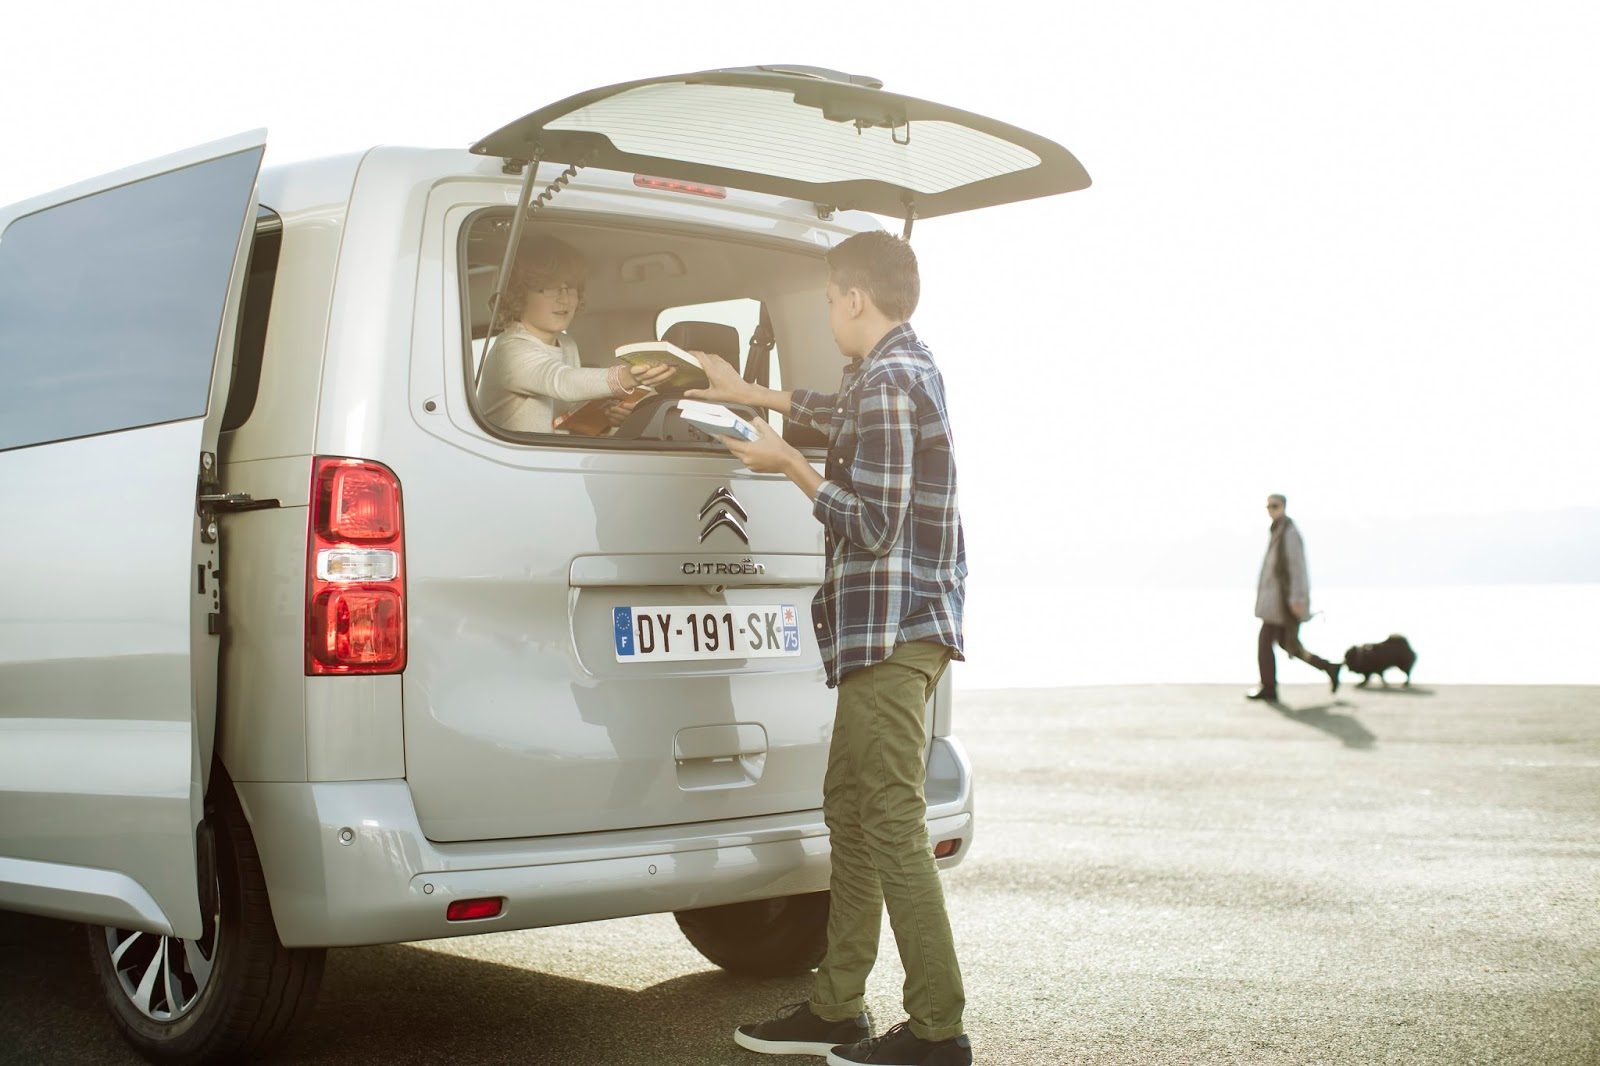 Copie%2Bde%2BCL%2B16.010.038 Με 5 Παγκόσμιες Πρεμιέρες η Citroën Στο Σαλόνι Αυτοκινήτου της Γενεύης